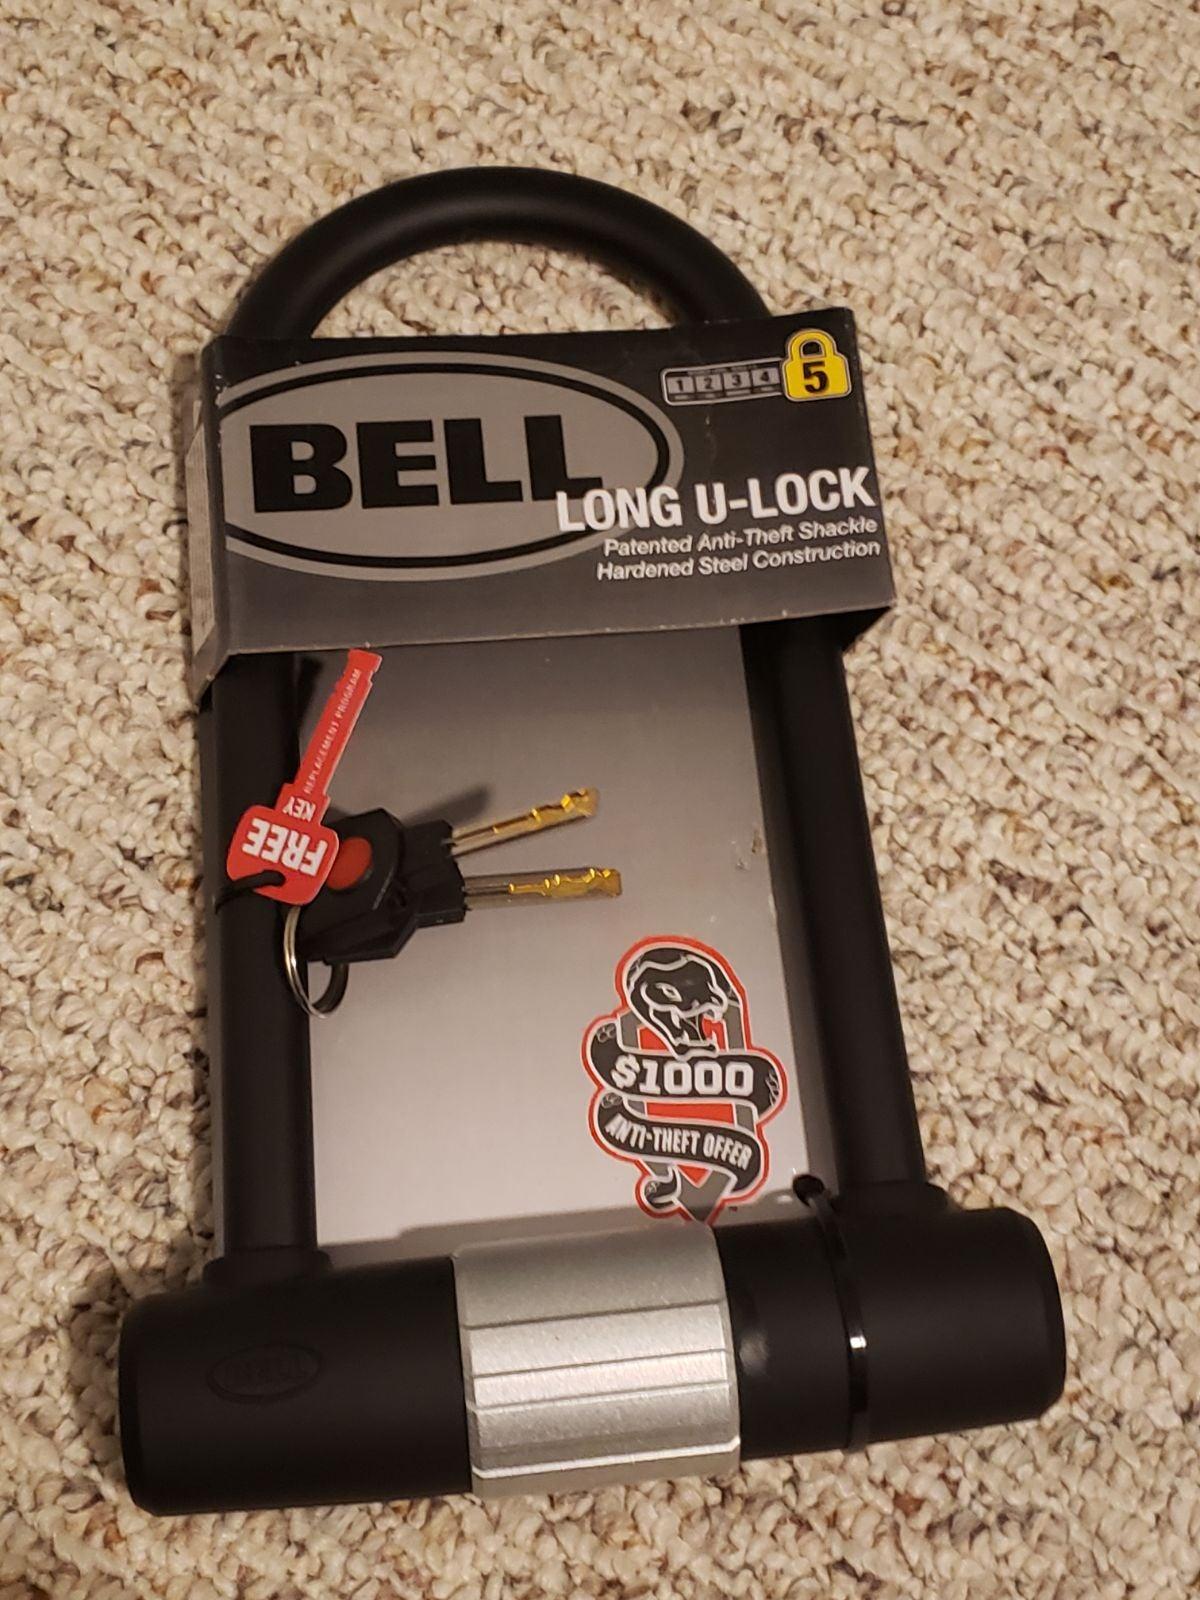 Bell Bike U-Bolt Lock Level 5 Bike Lock